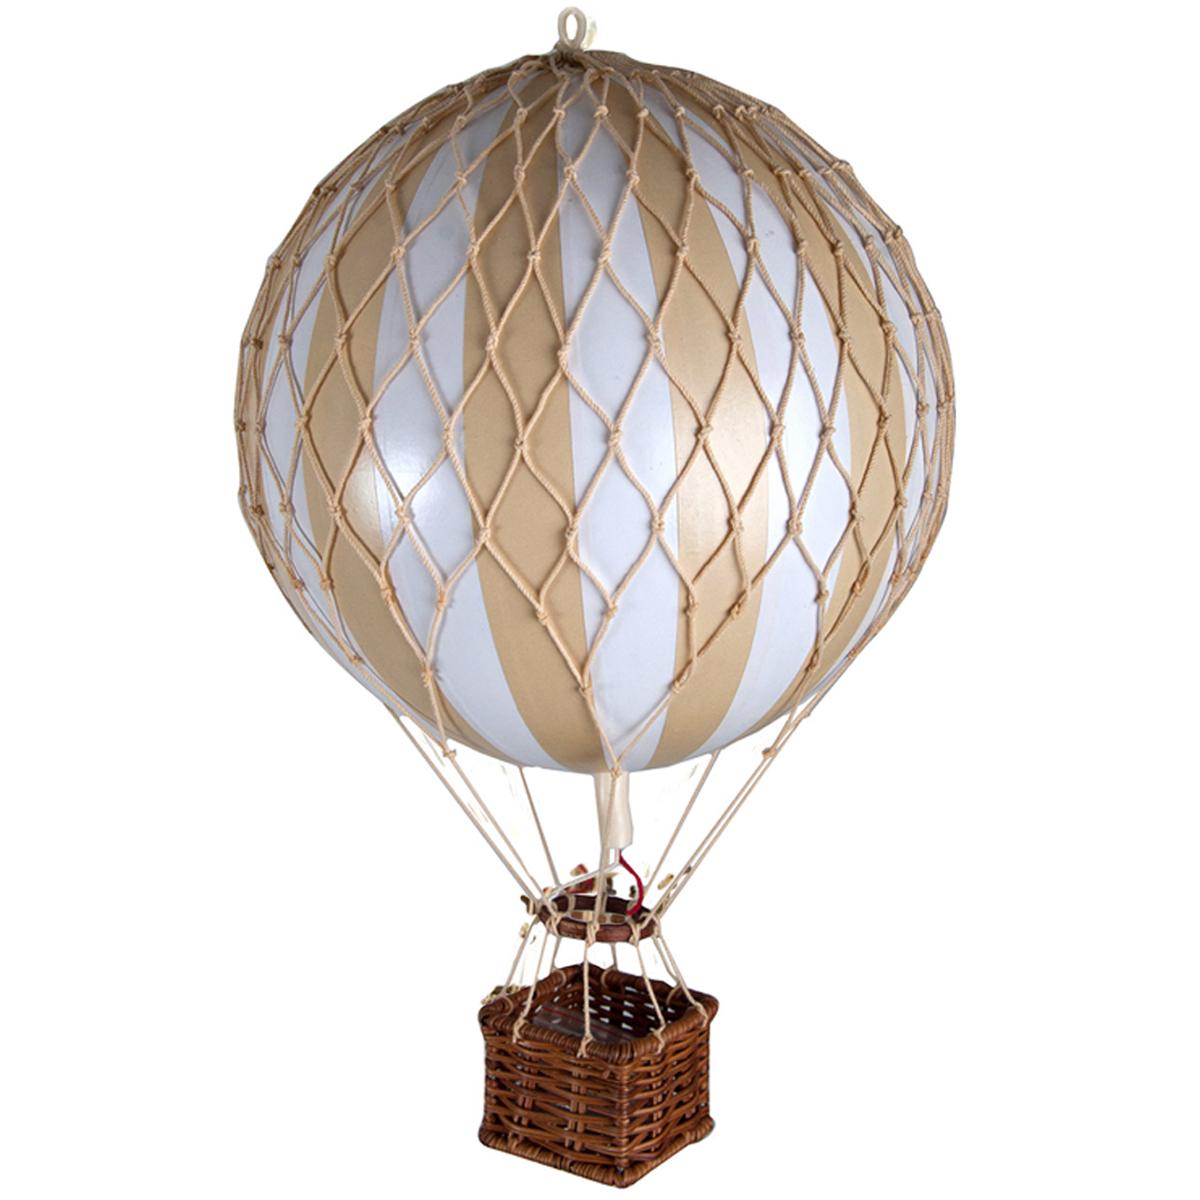 Image of Authentic Models luftballon 32 cm - hvid og ivory